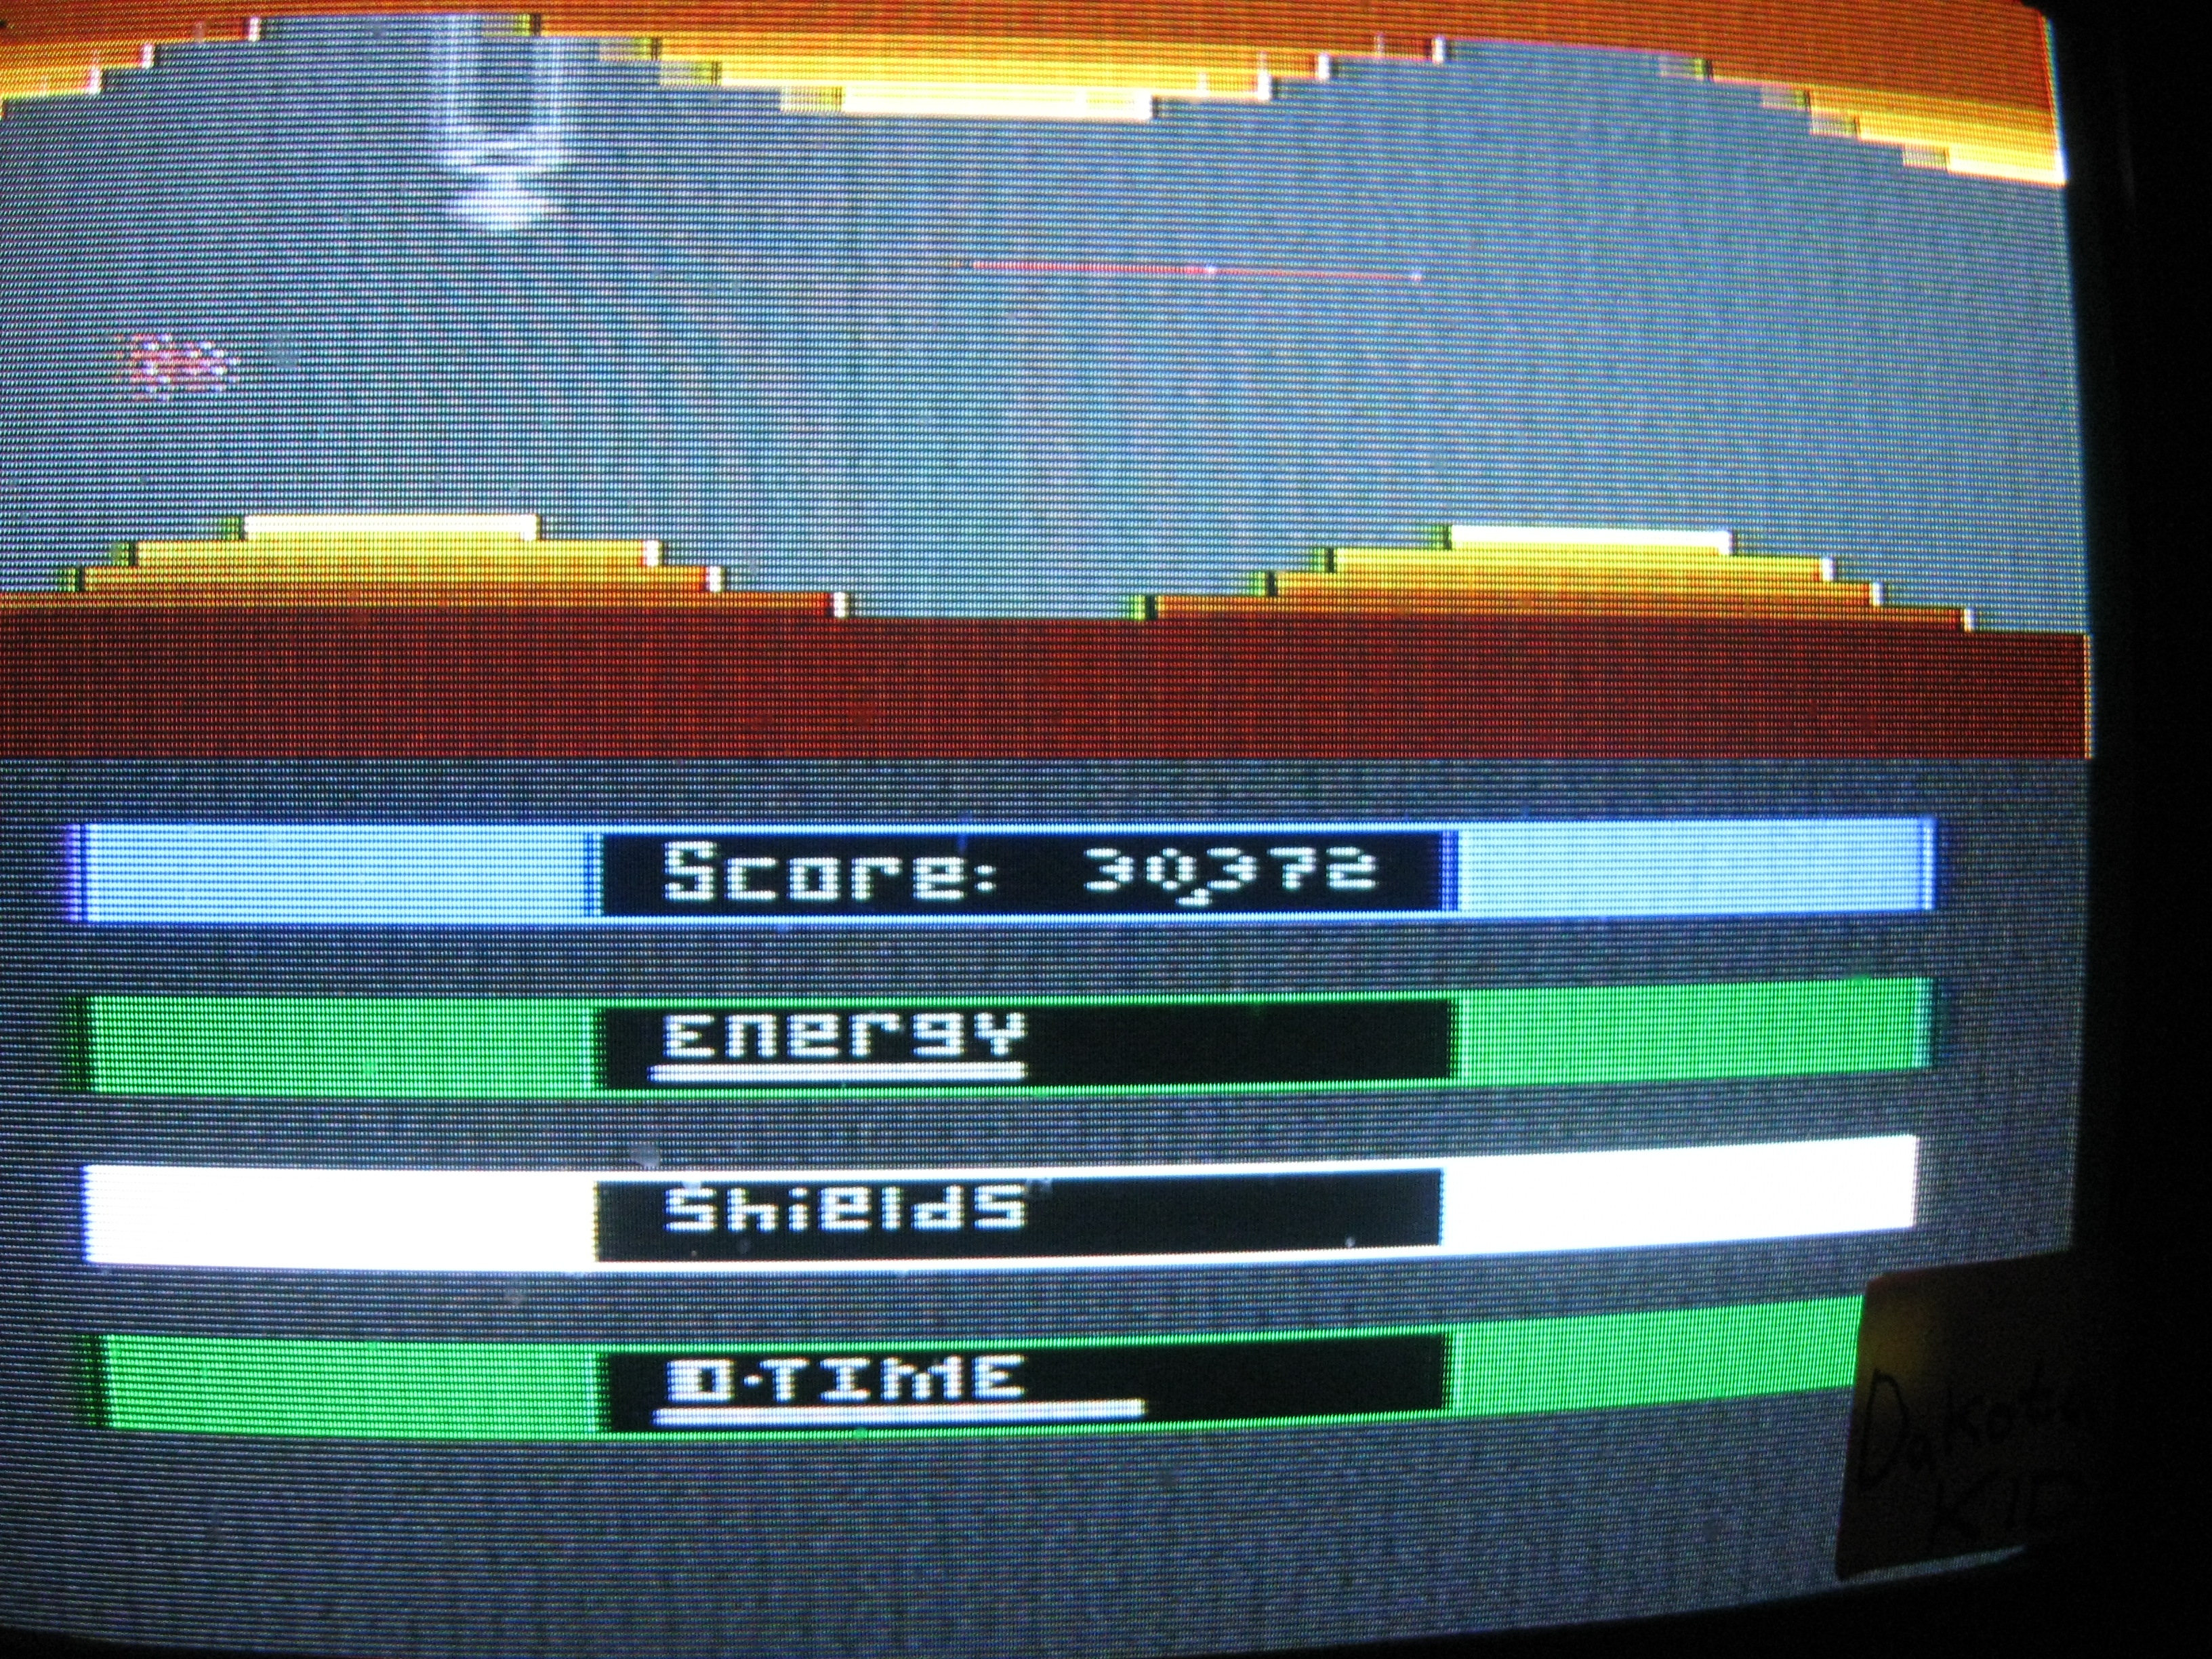 Laser Gates 30,372 points